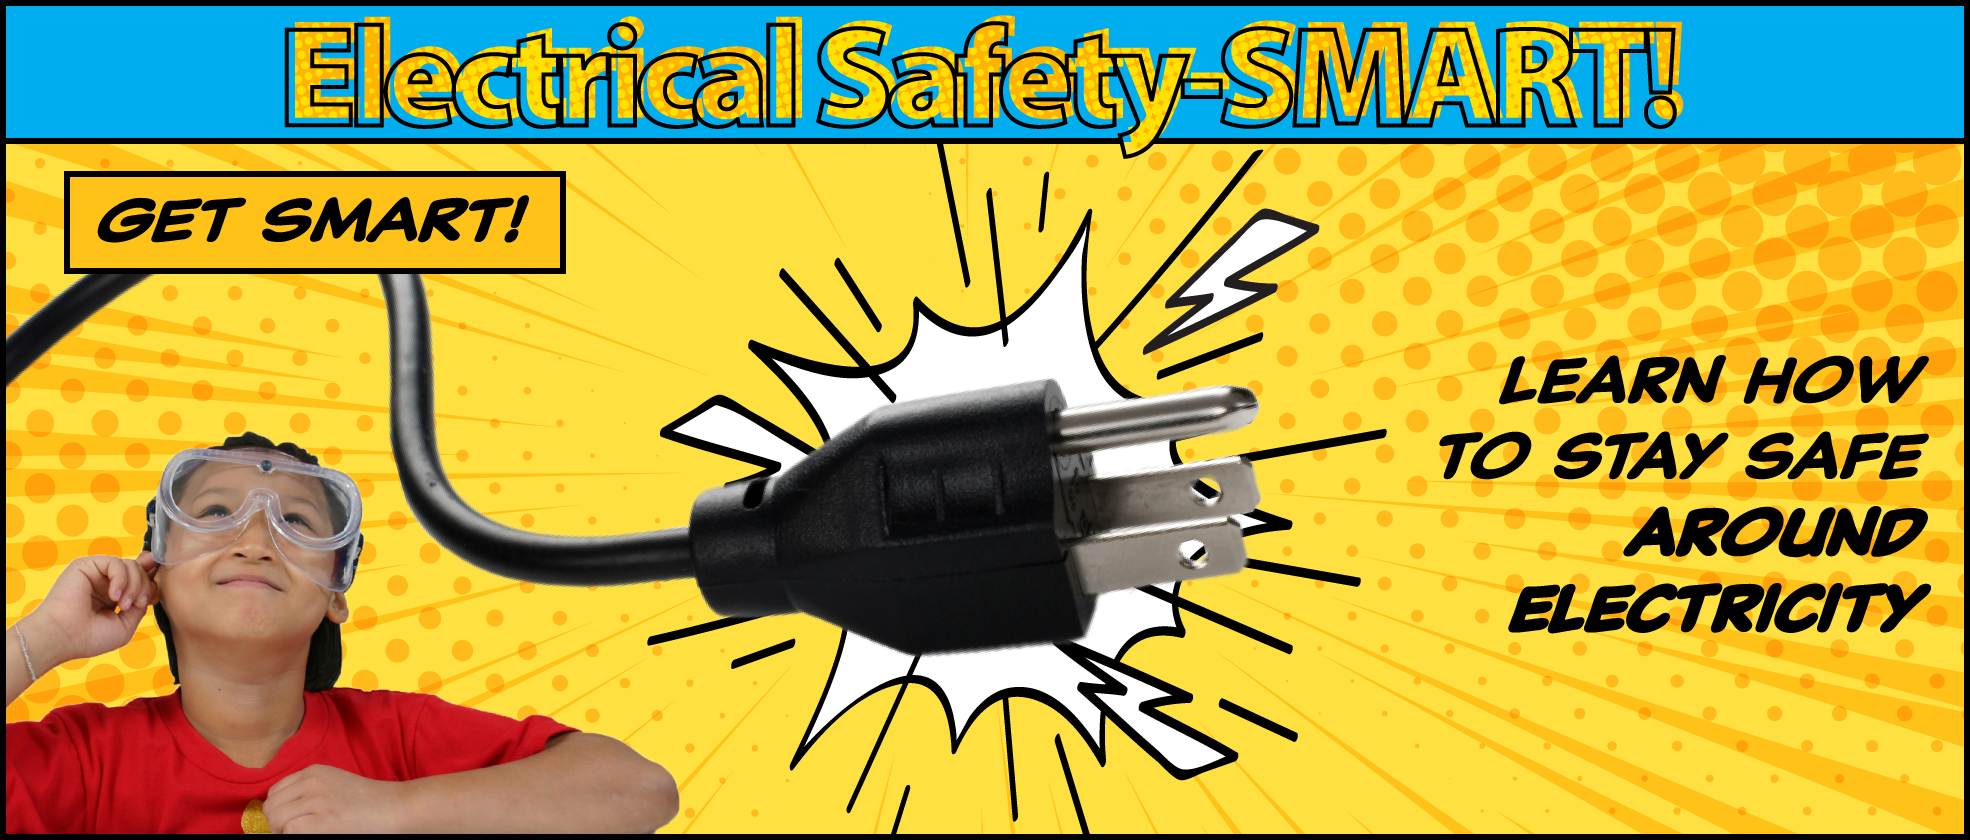 66410 Elec Safety SMART hmpg carousel 1970x840